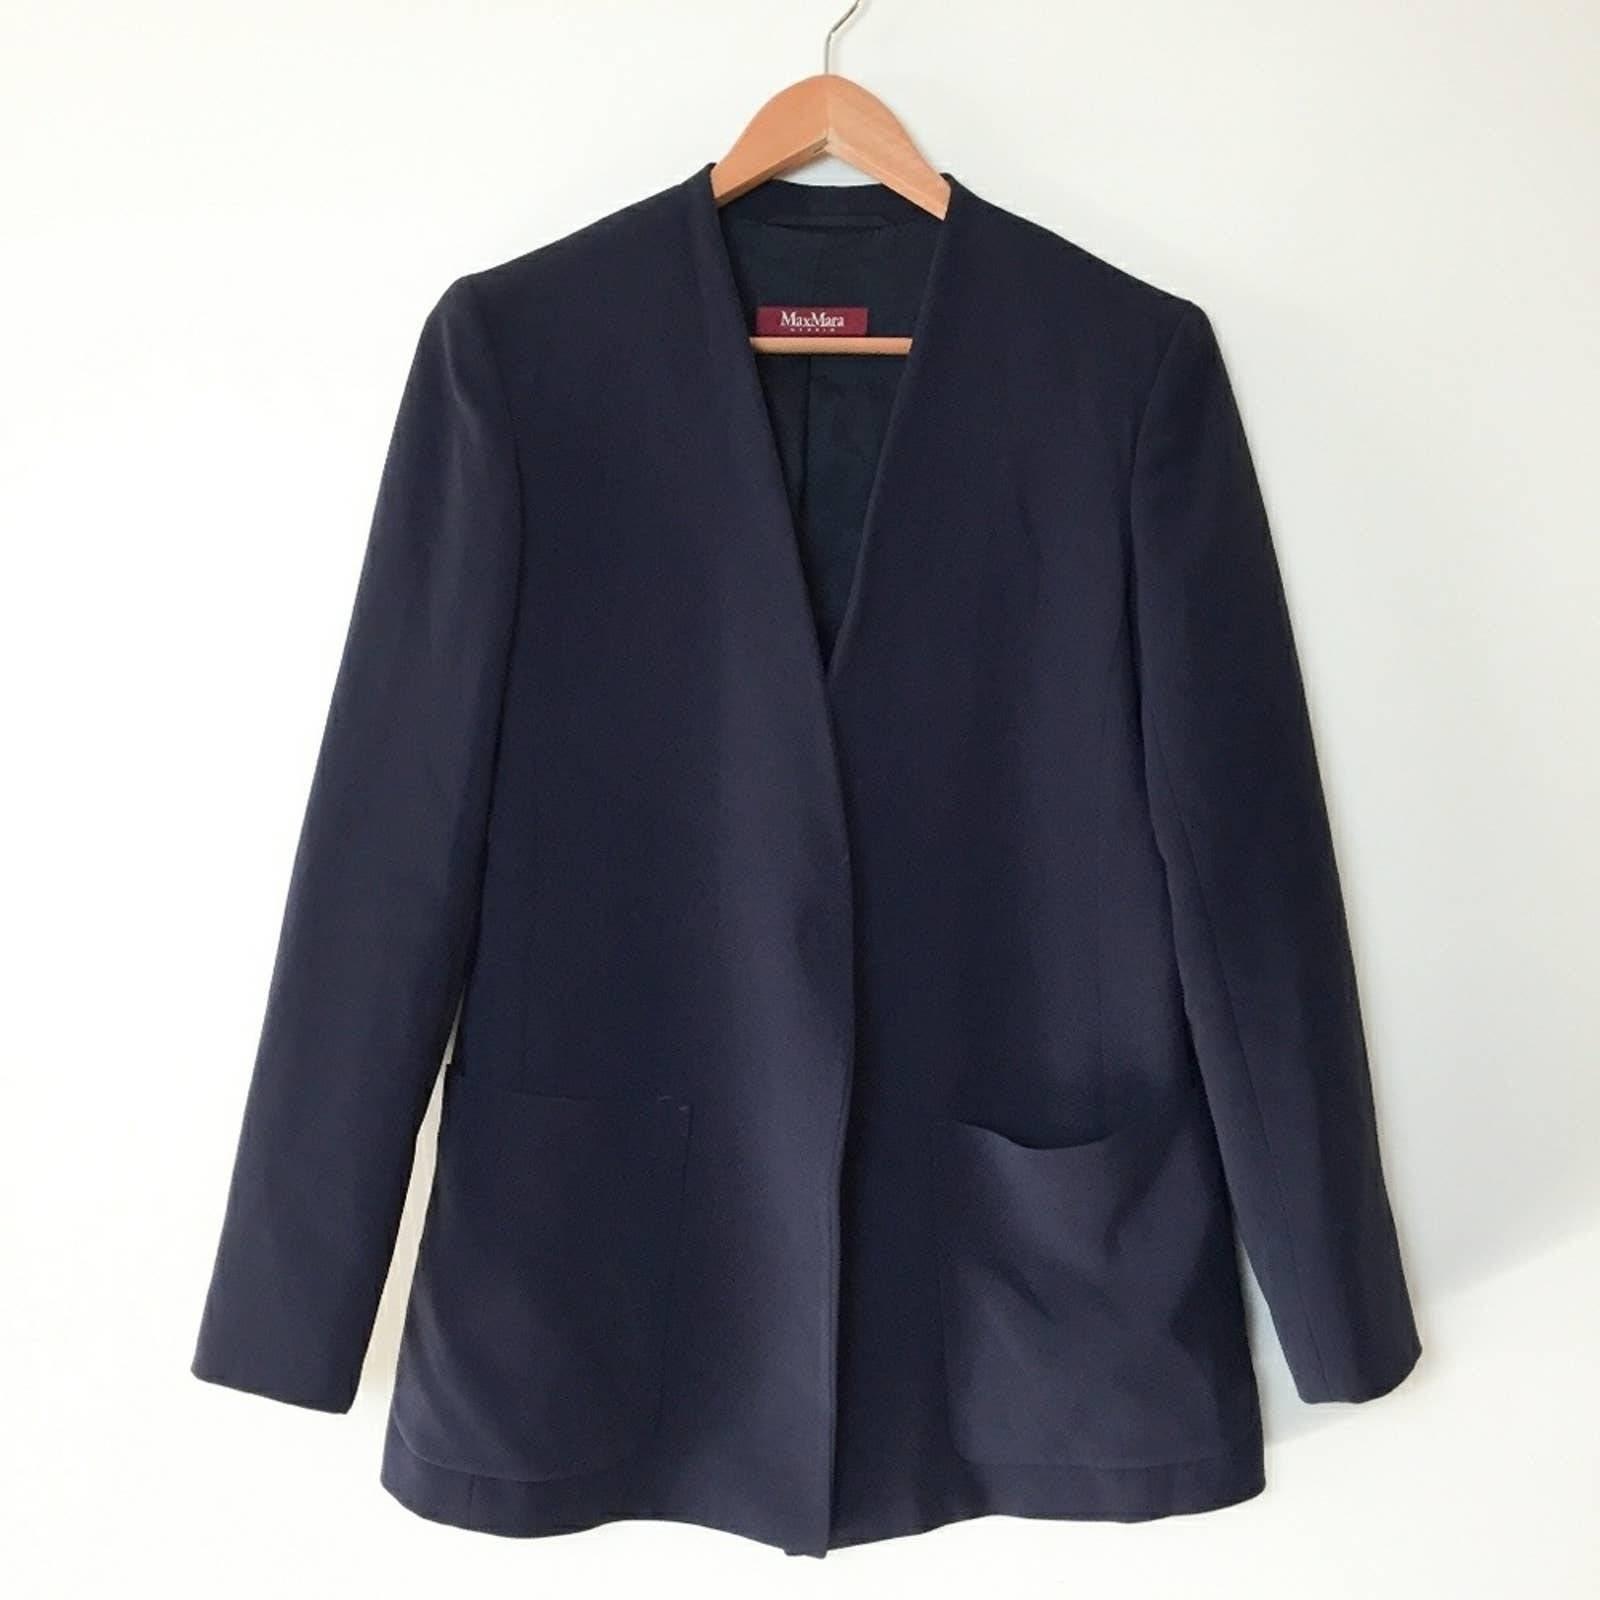 MaxMara Button Front Structured Jacket